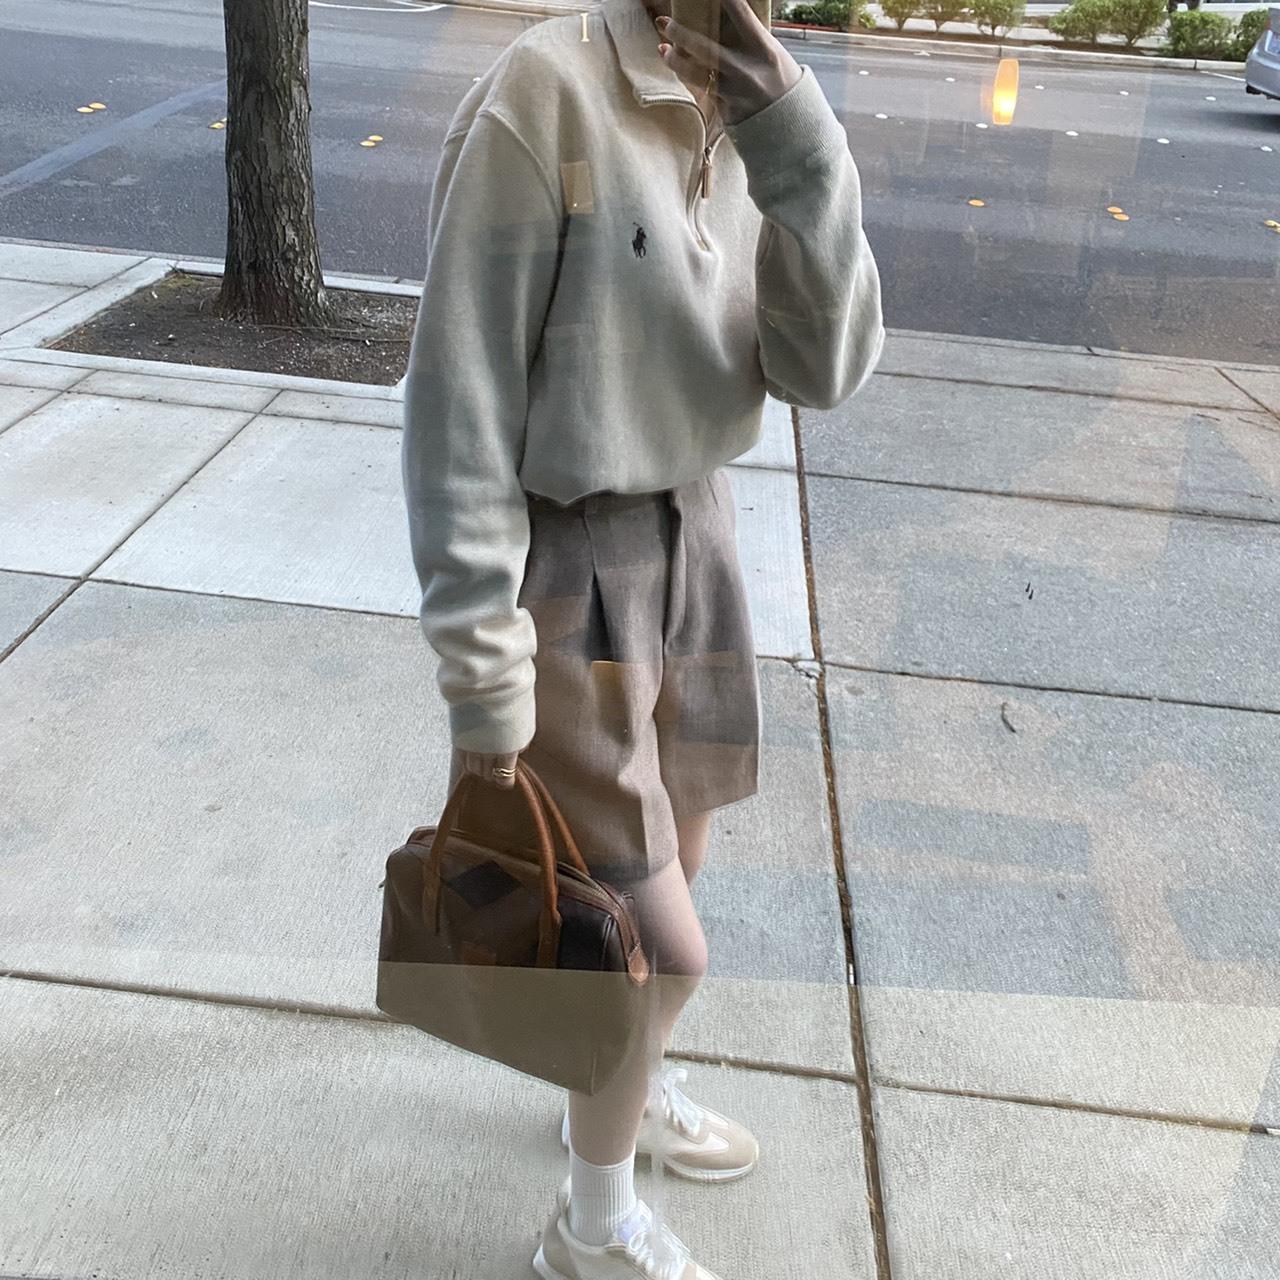 DAYNYC casual half pants